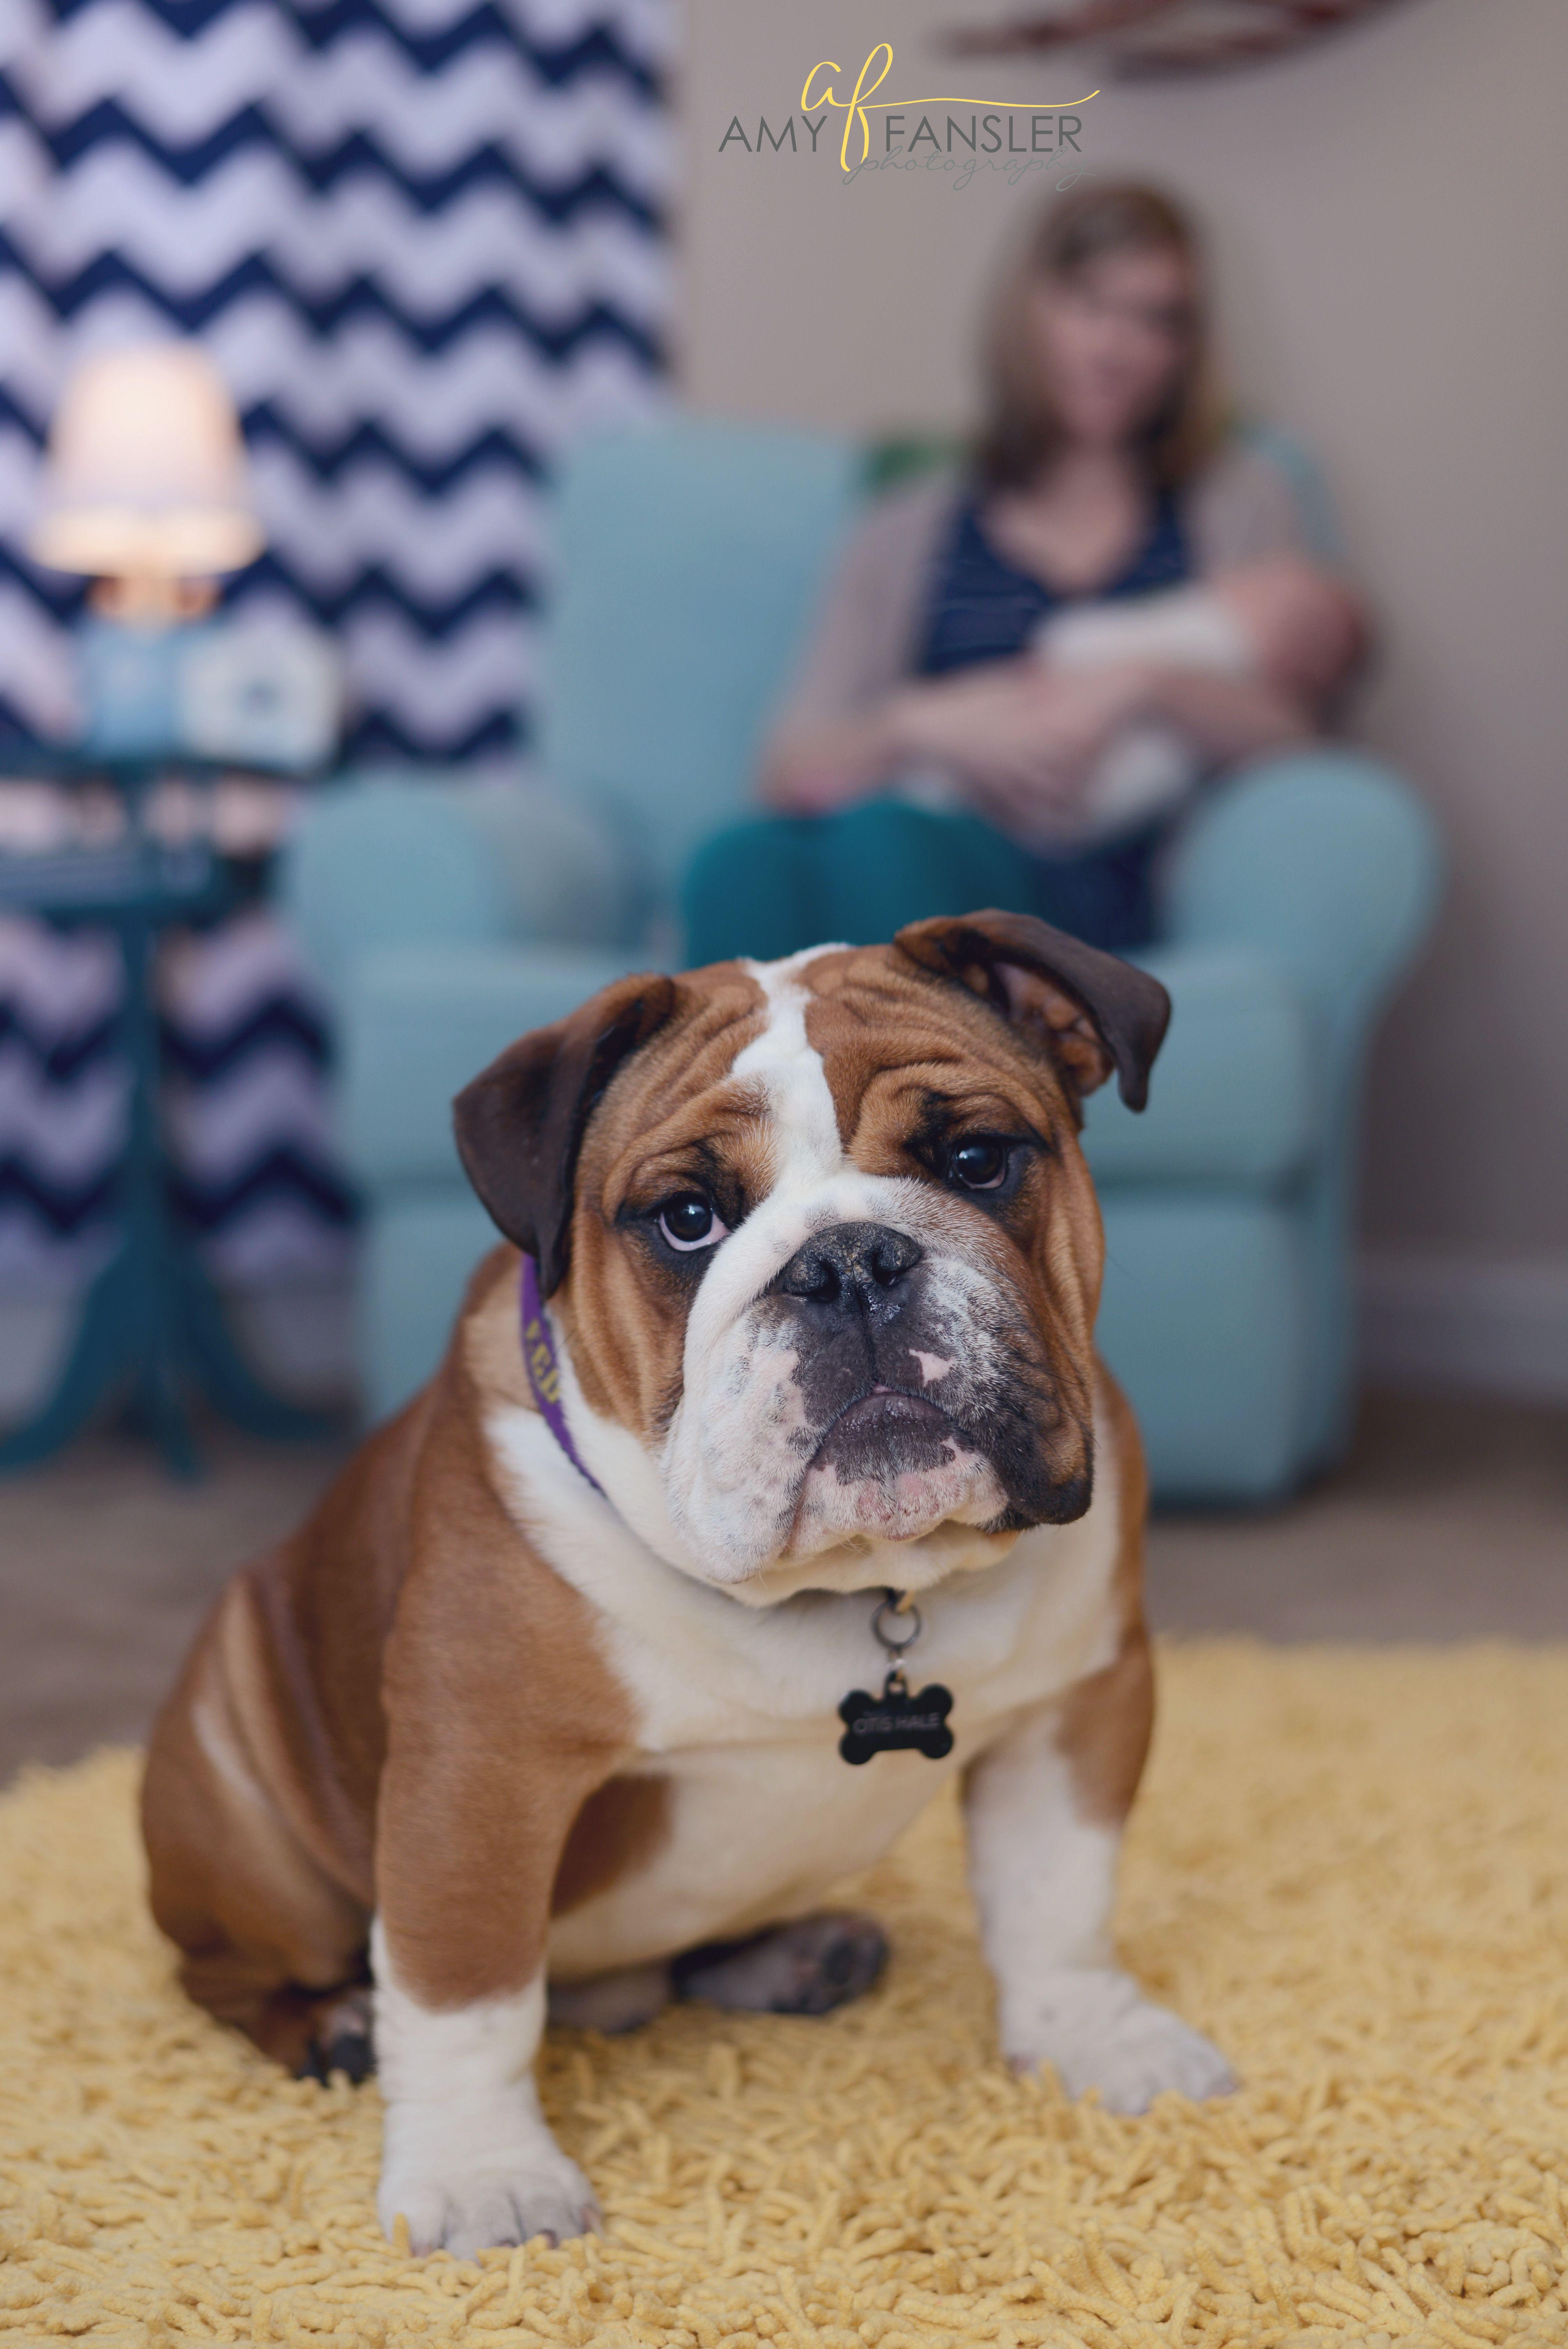 Newborn Baby Bulldogs : newborn, bulldogs, Bulldog, Nursery, Newborn, Photography, Holding, Www.amyfanslerphotography.com, Ral…, Bulldog,, Photography,